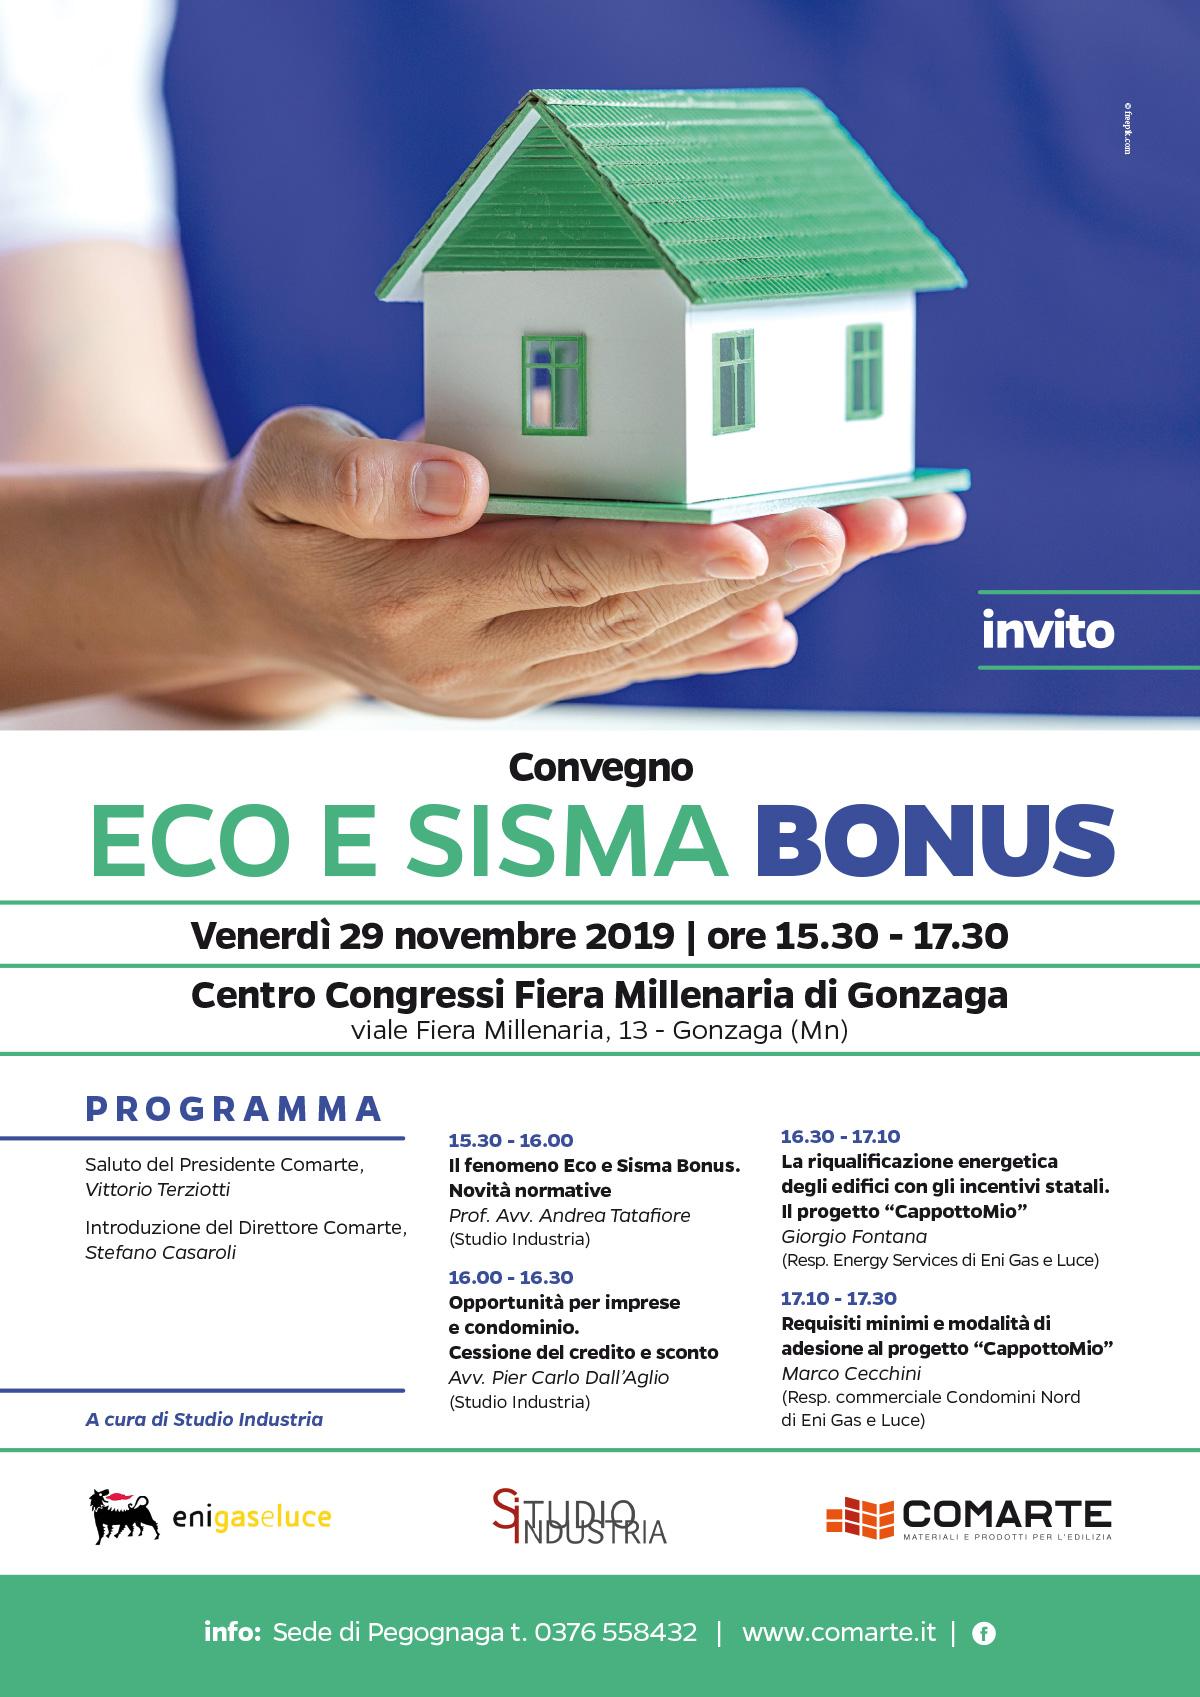 Eco e Sisma Bonus Convegno